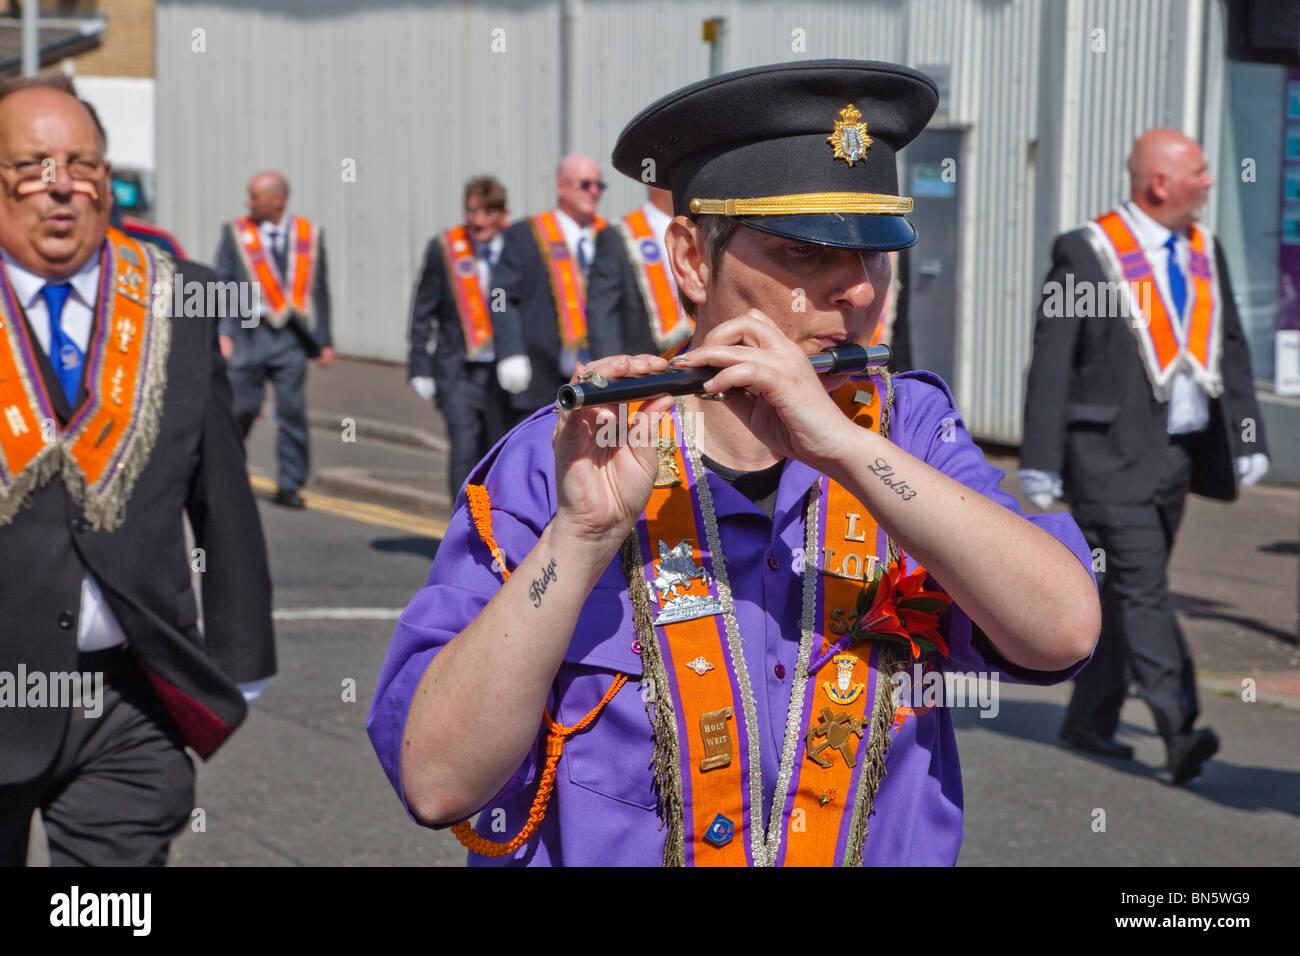 Man playing the flute during an Orange Walk parade, Greenock, Glasgow, Scotland - Stock Image